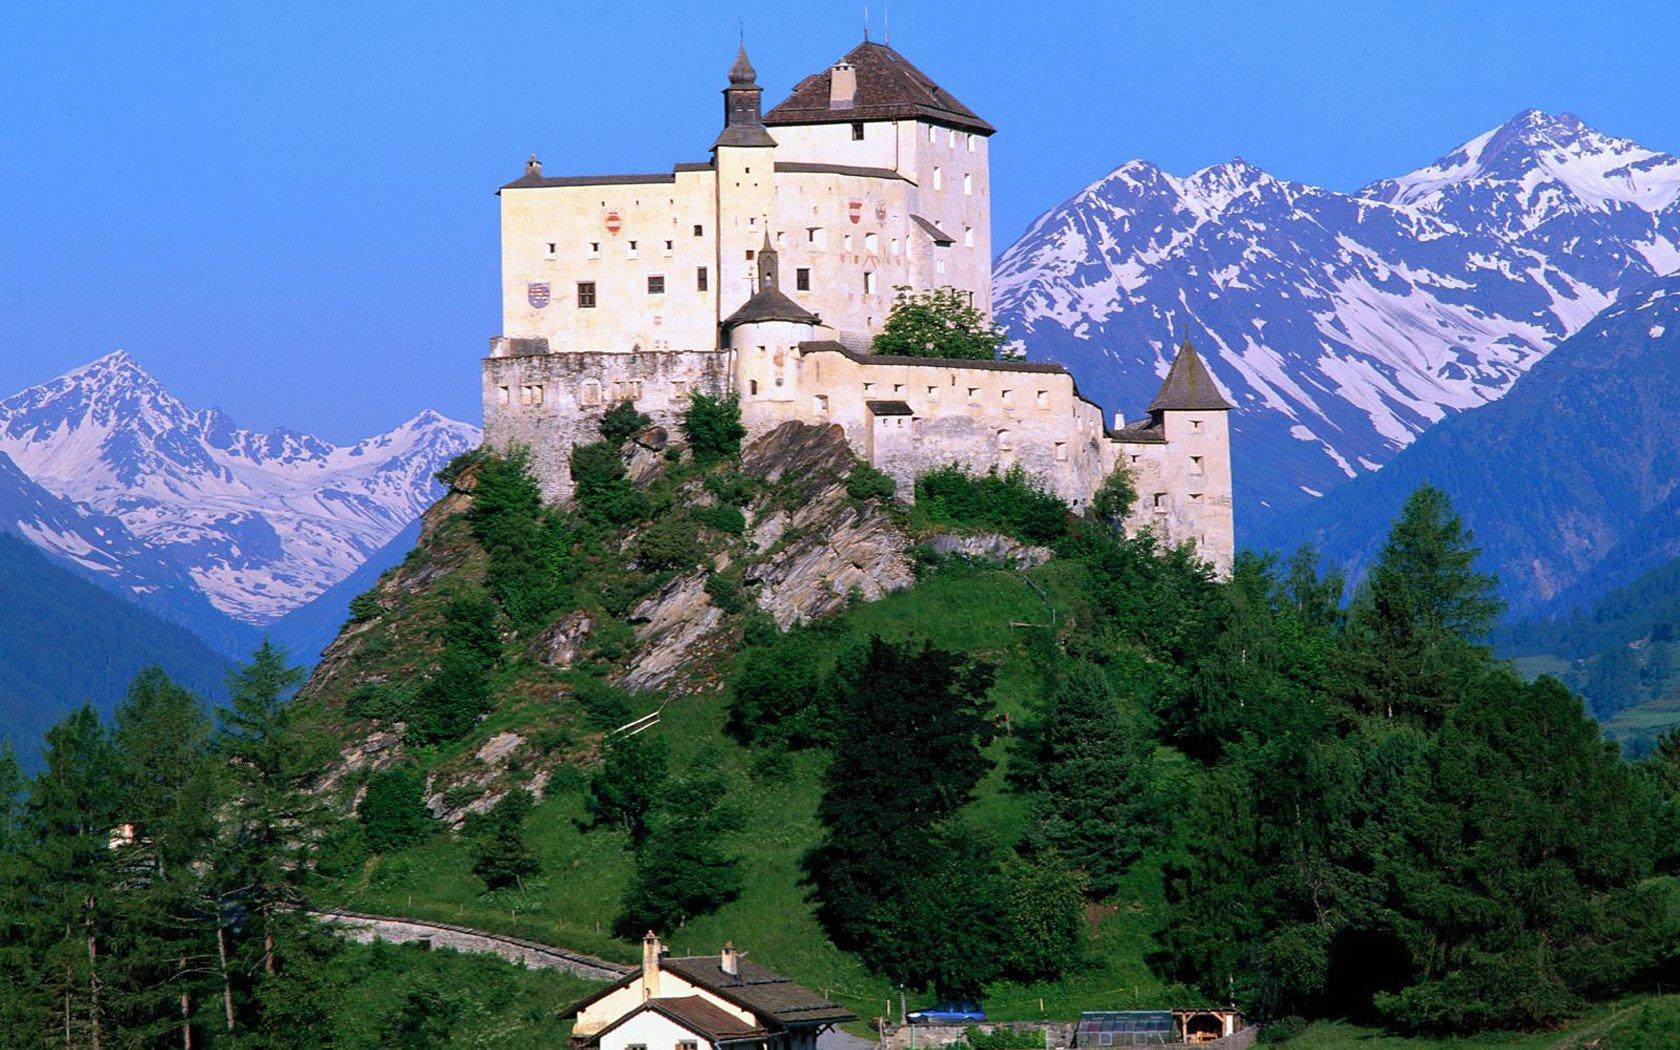 tarasp-castle-graubuden-switzerland